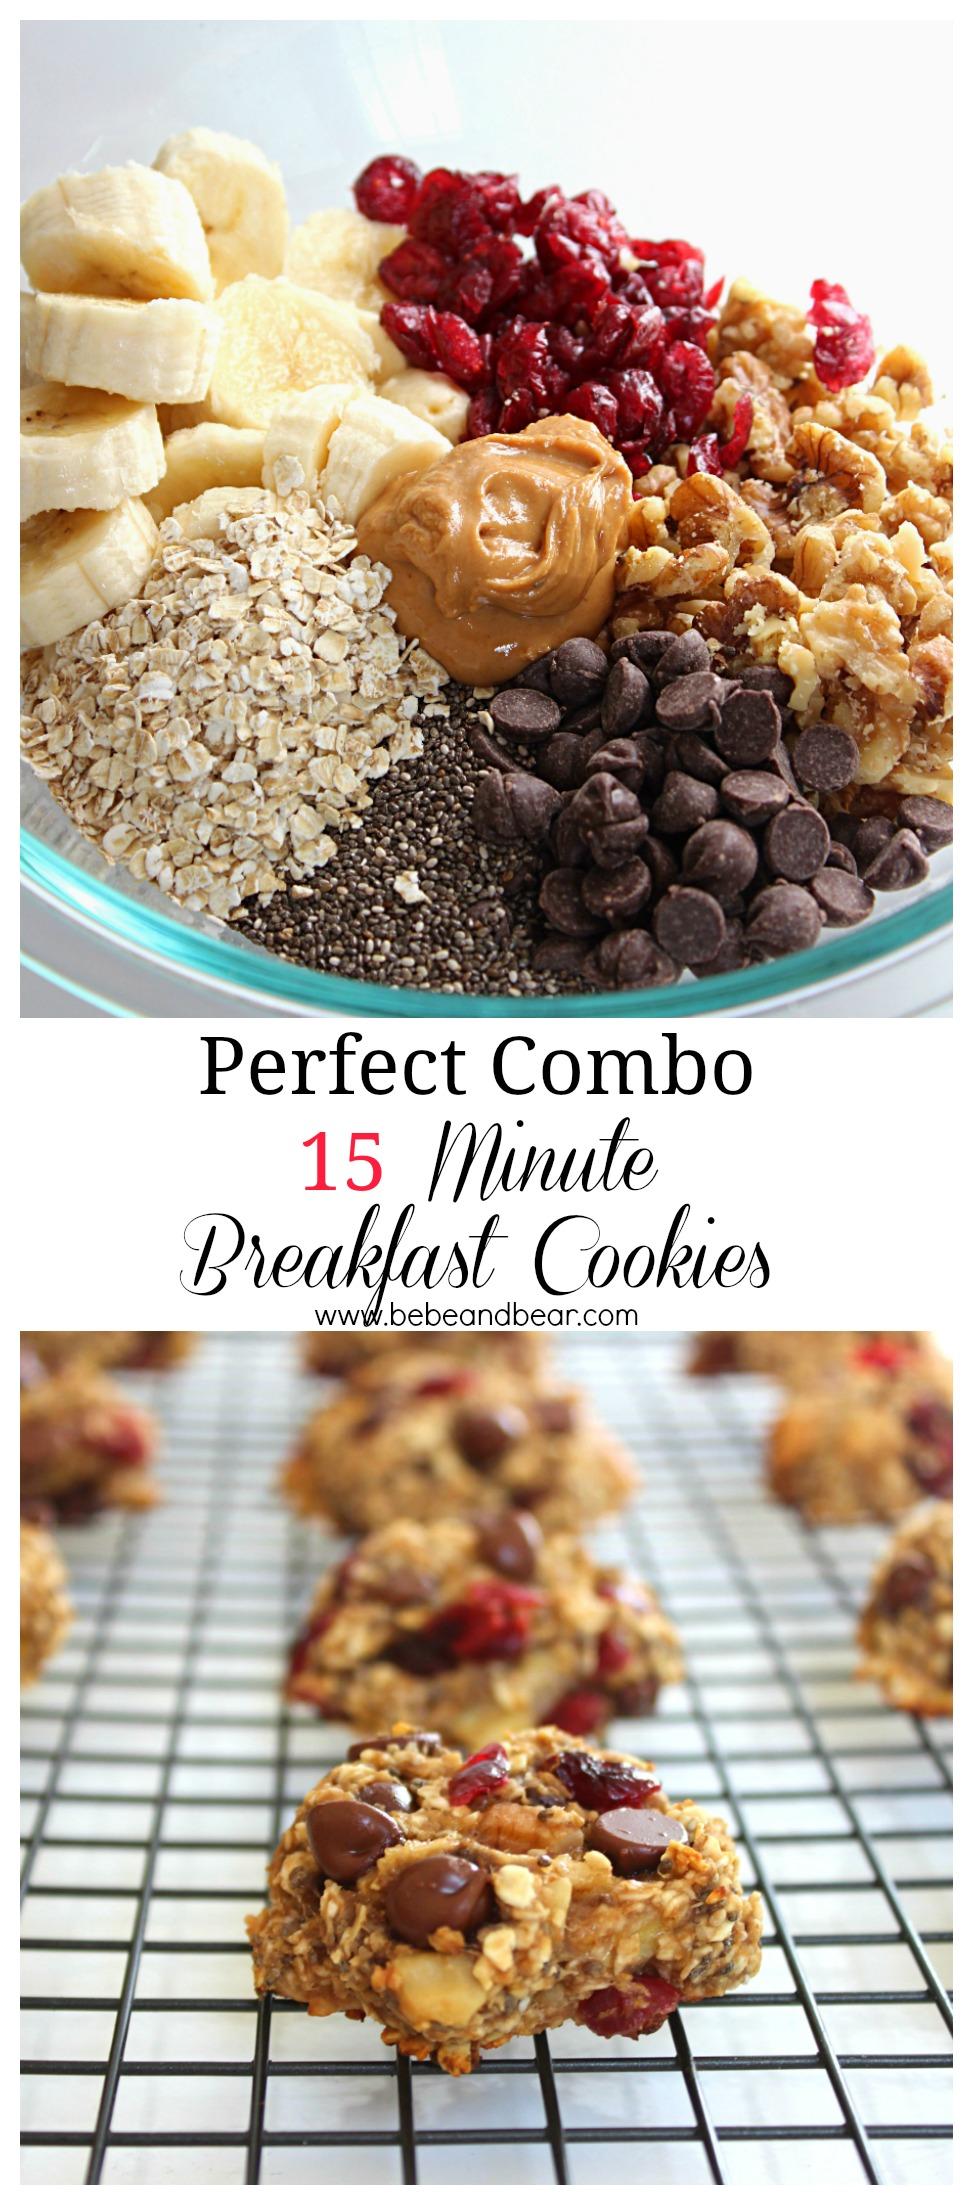 Perfect Combo 15 minute healthy breakfast cookies.